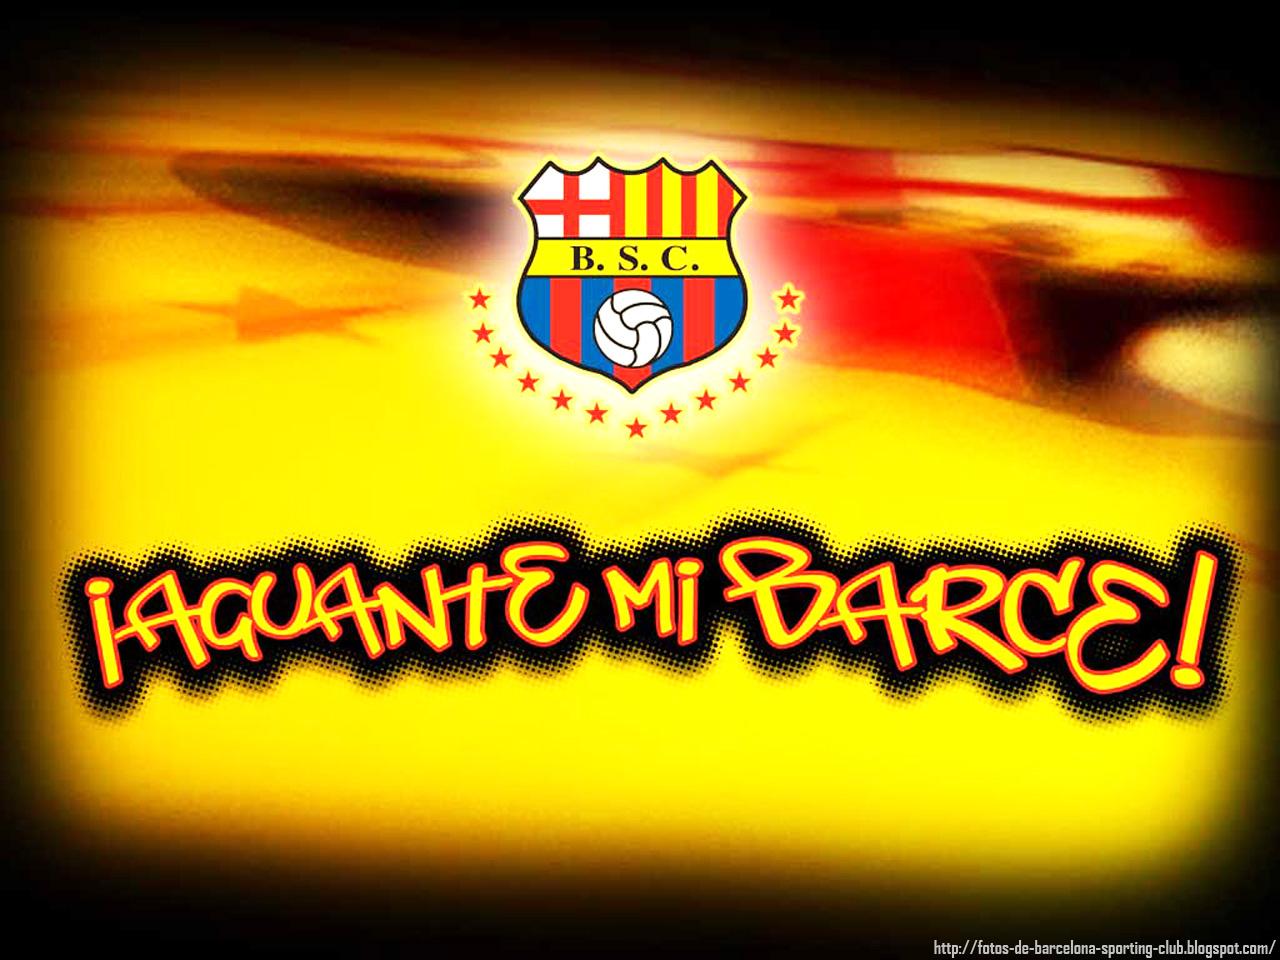 http://3.bp.blogspot.com/-3I0Go1iDkE4/UBfvf06jIaI/AAAAAAAABXM/AbLkWCFF368/s1600/Fotos+Wallpaper+Barcelona+Sporting+Club+Guayaquil+Ecuador.jpg